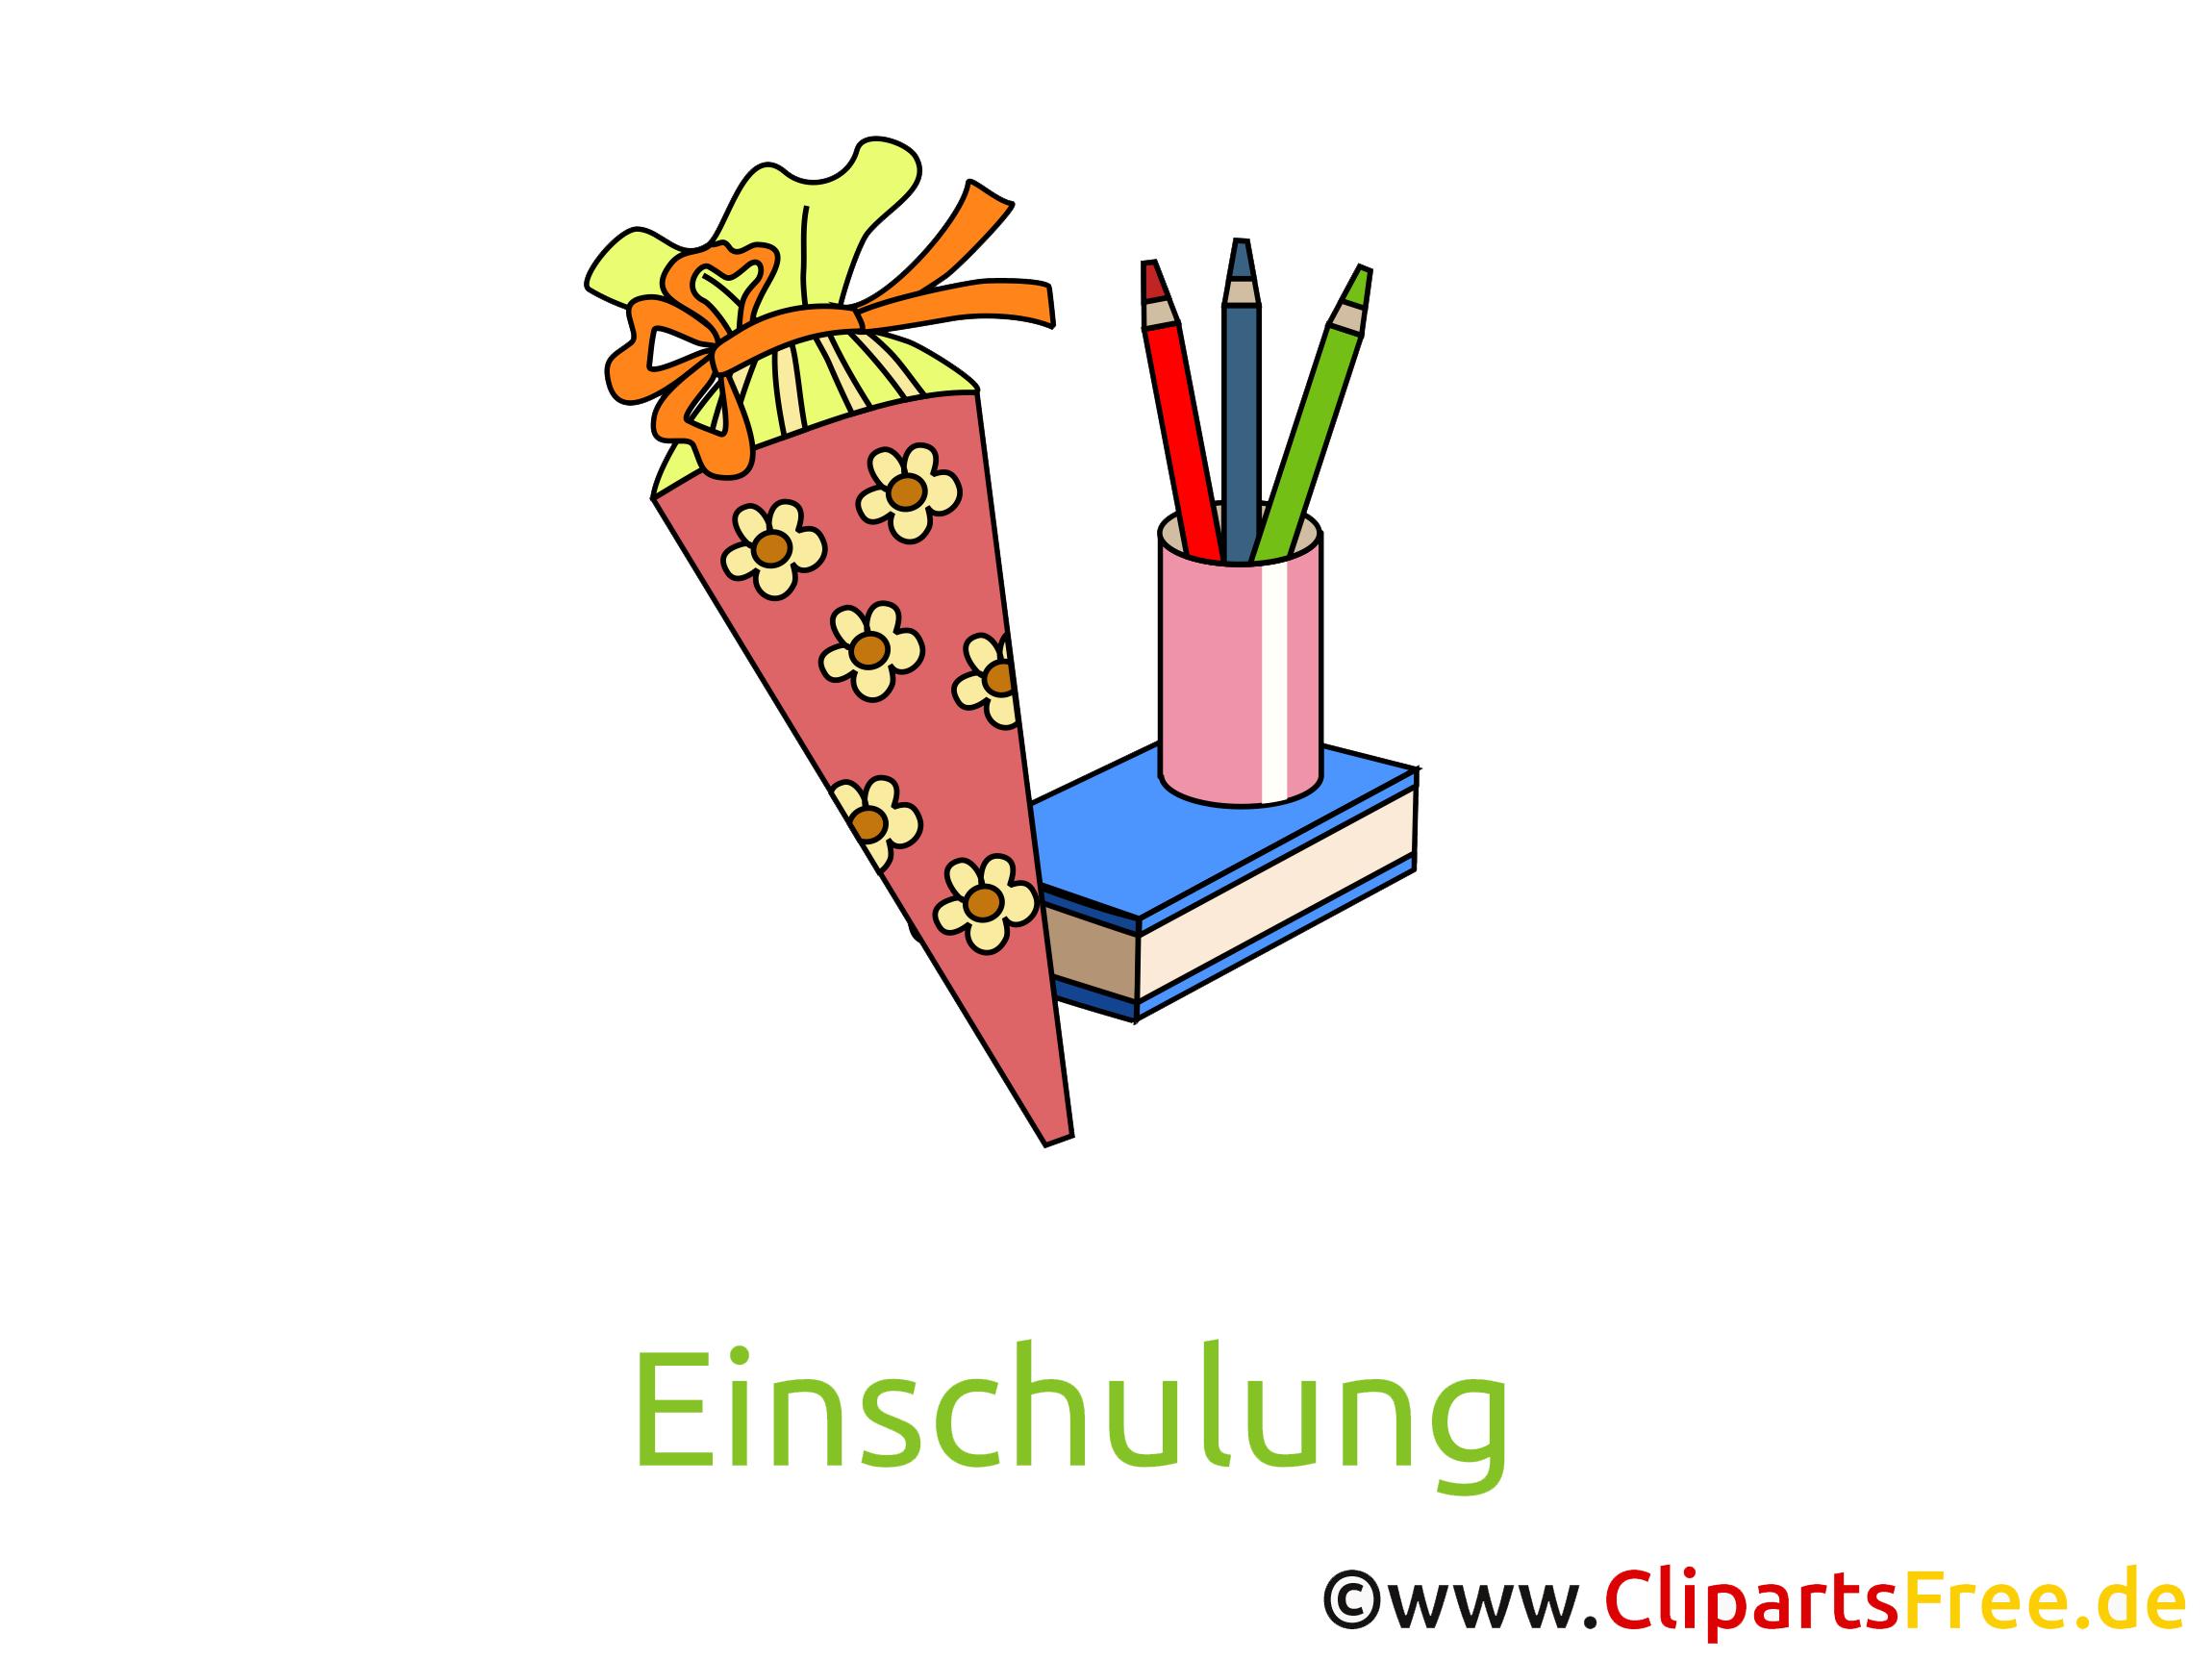 Clipart kostenlos schulanfang picture transparent download Zuckertuete zum Schulanfang picture transparent download